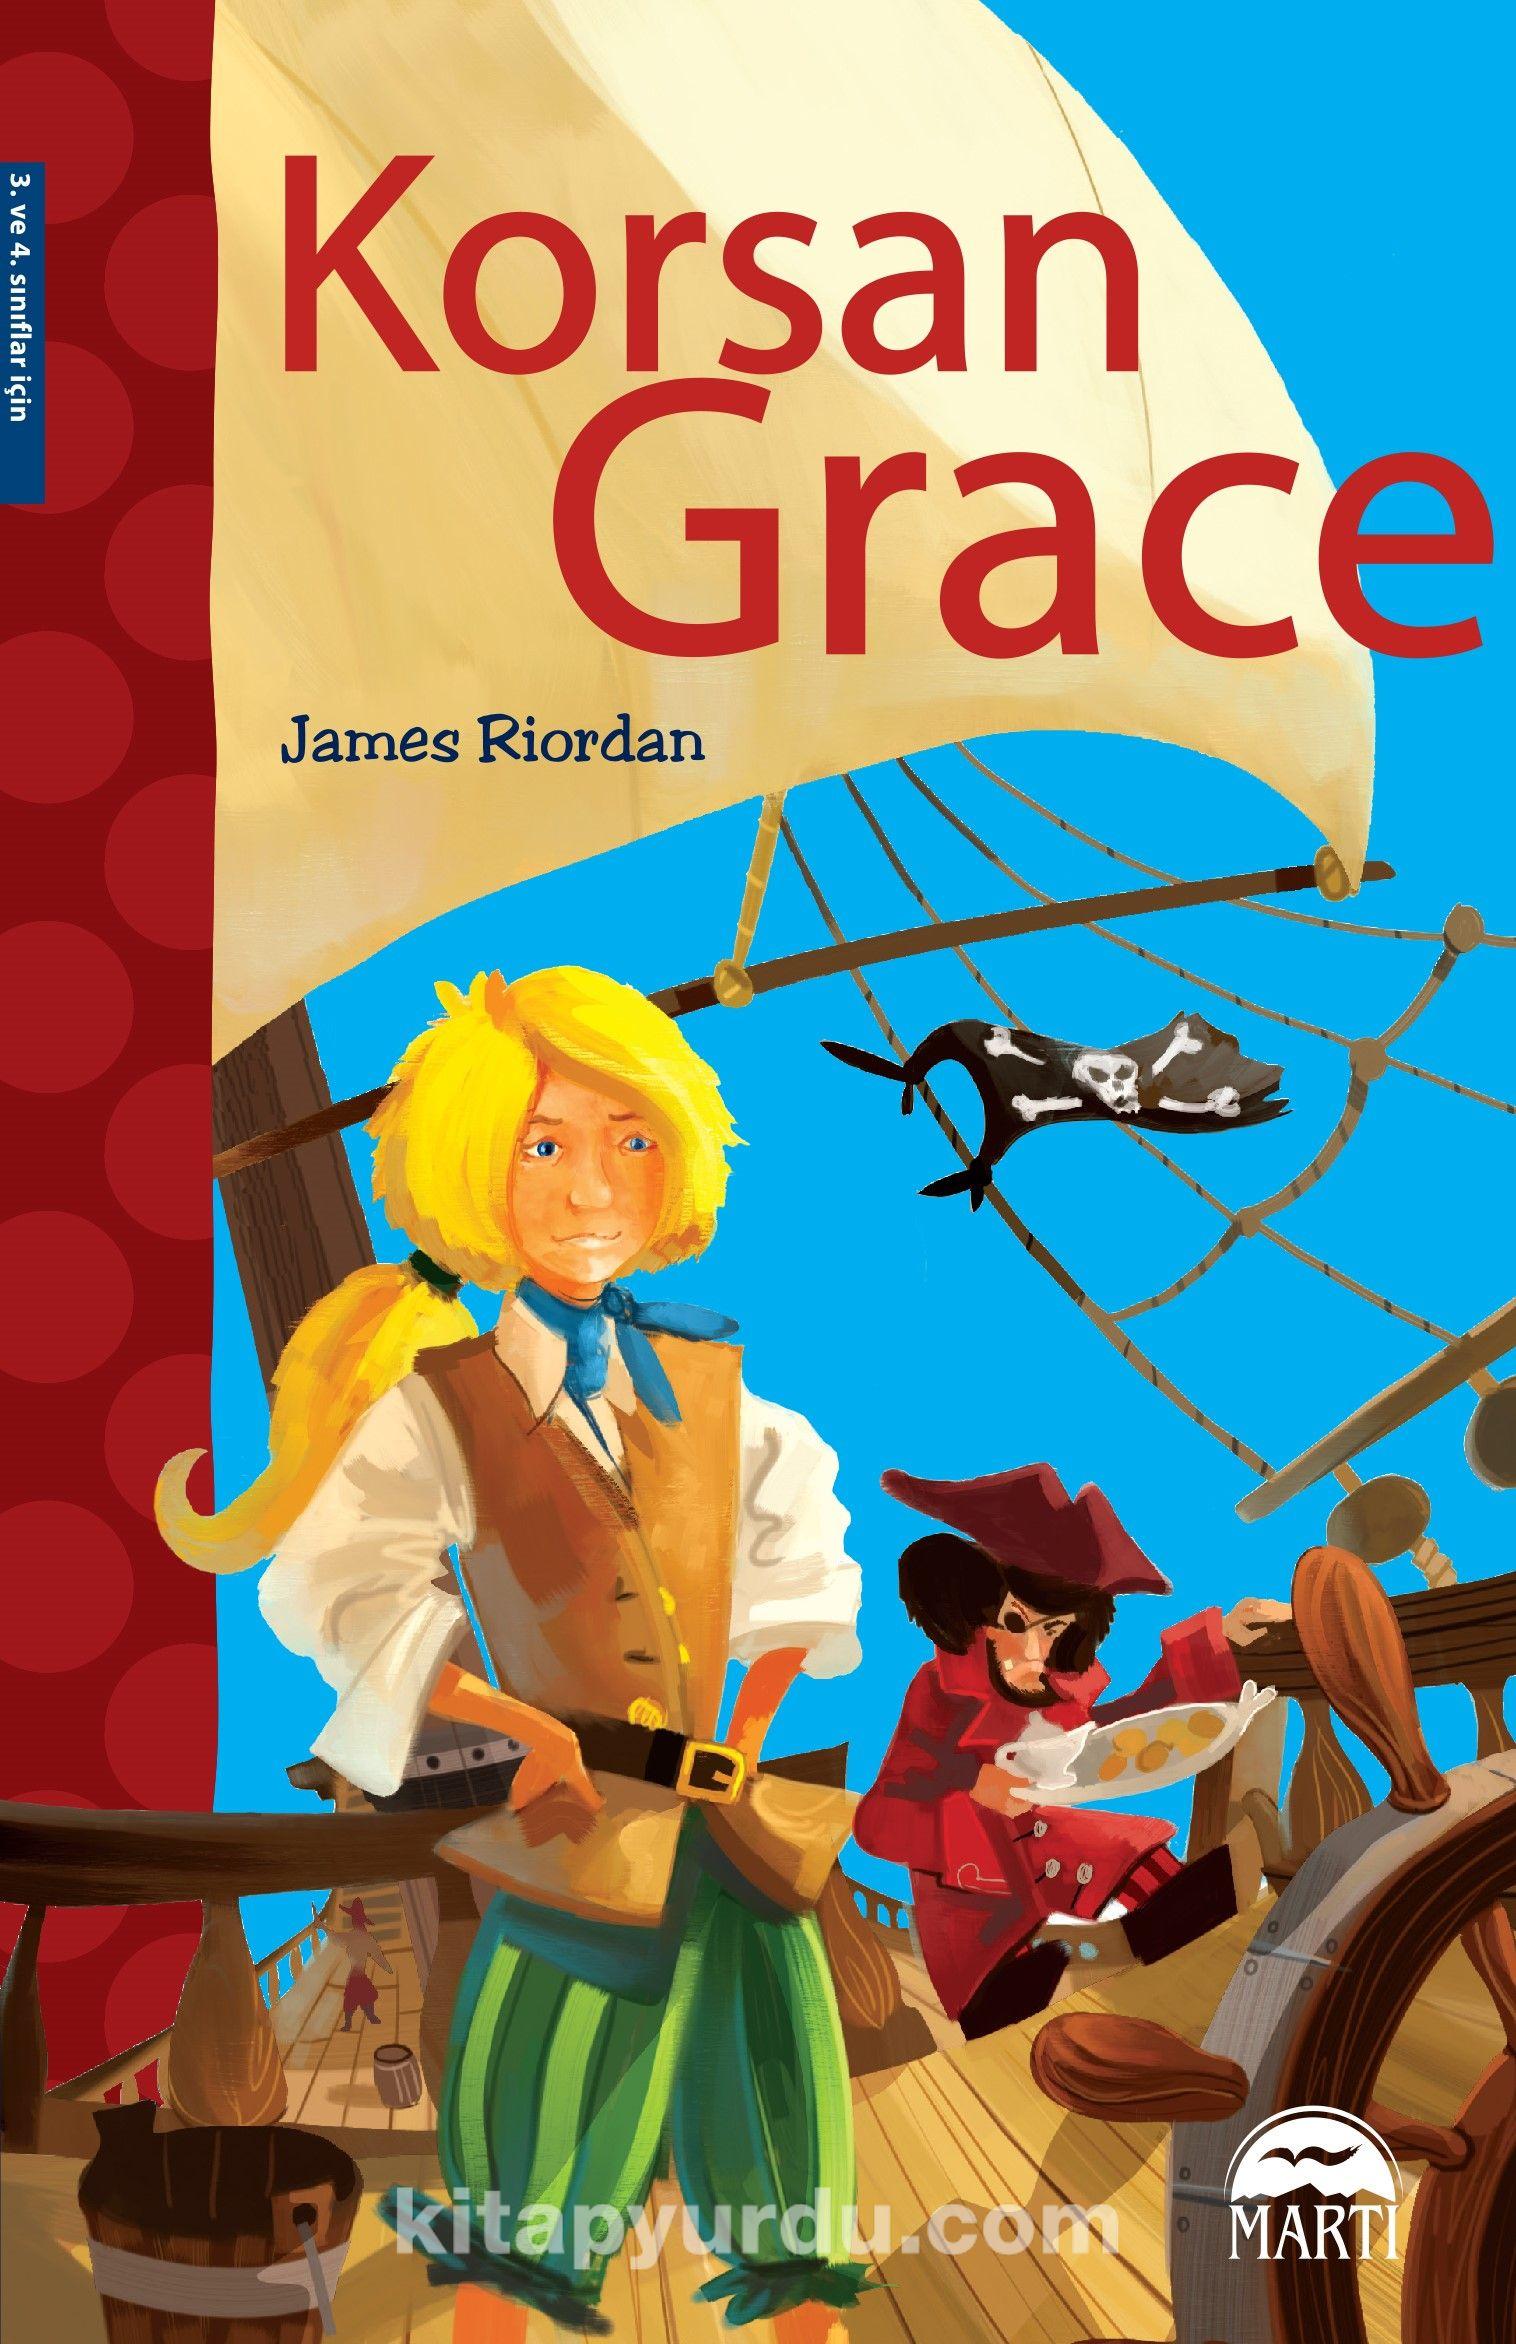 Korsan Grace